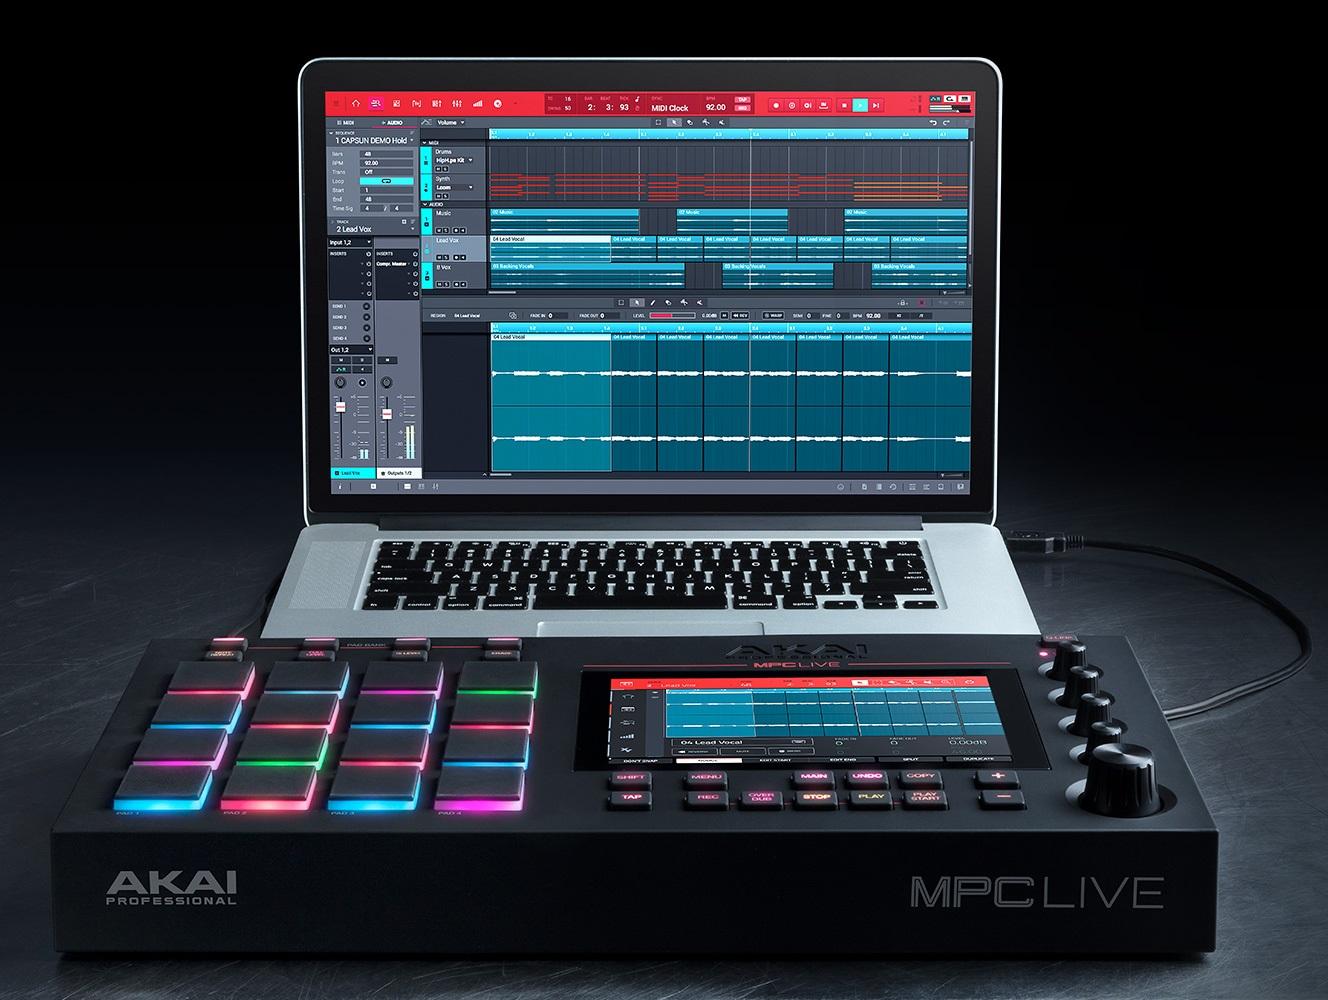 Auria Pro Review - The Best iPad DAW? - AudioNewsRoom